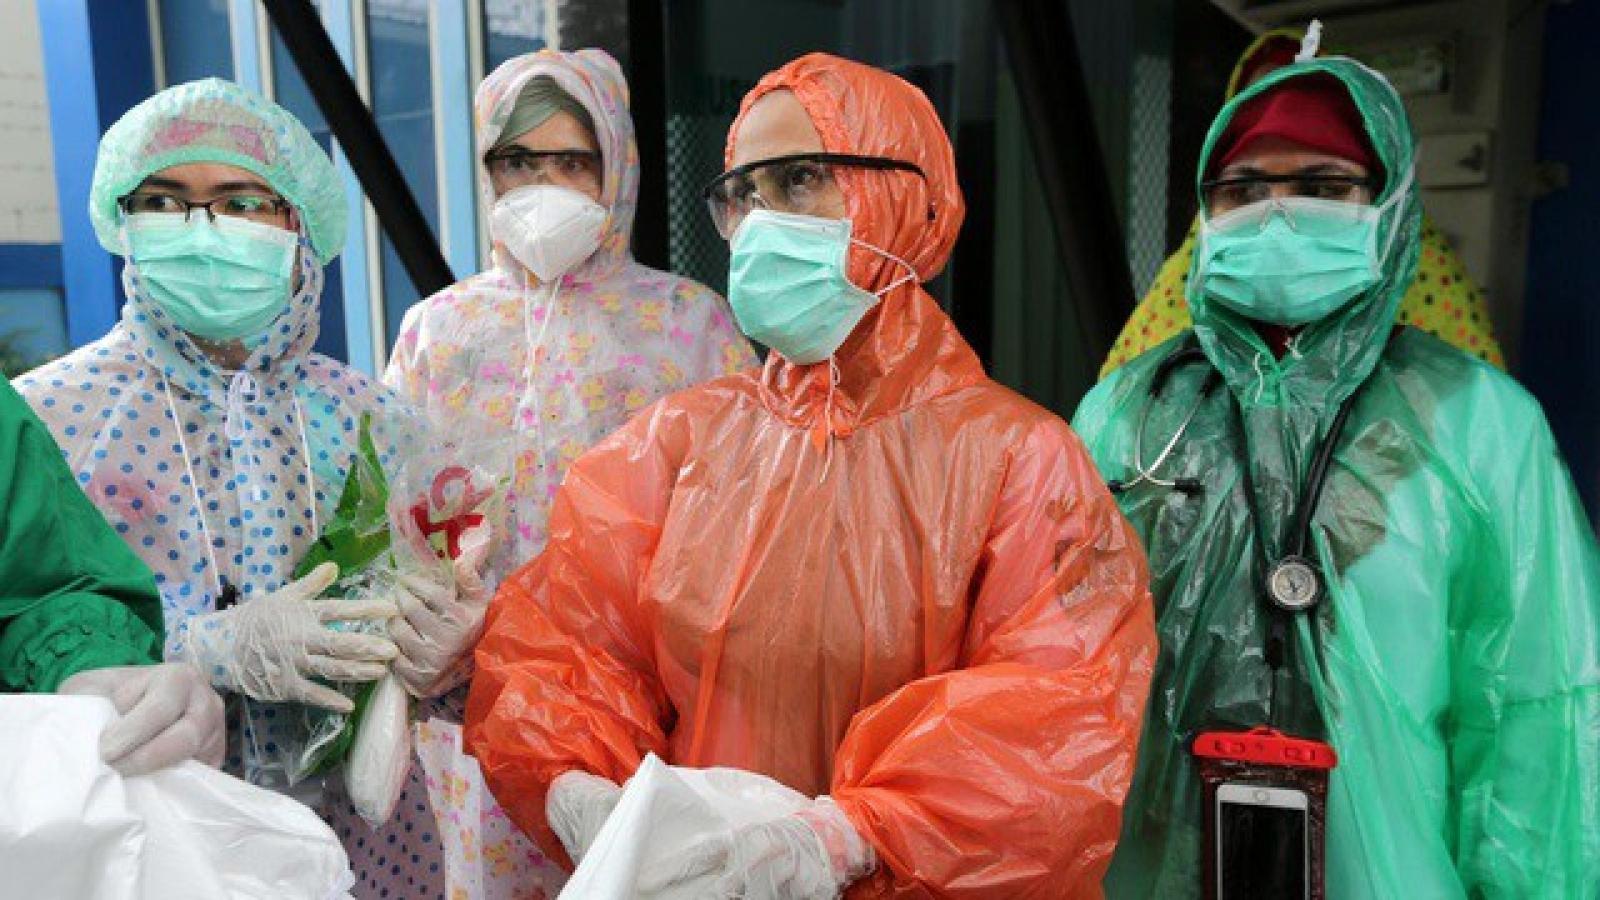 Indonesia tham gia tìm kiếm vaccine phòng ngừa Covid-19